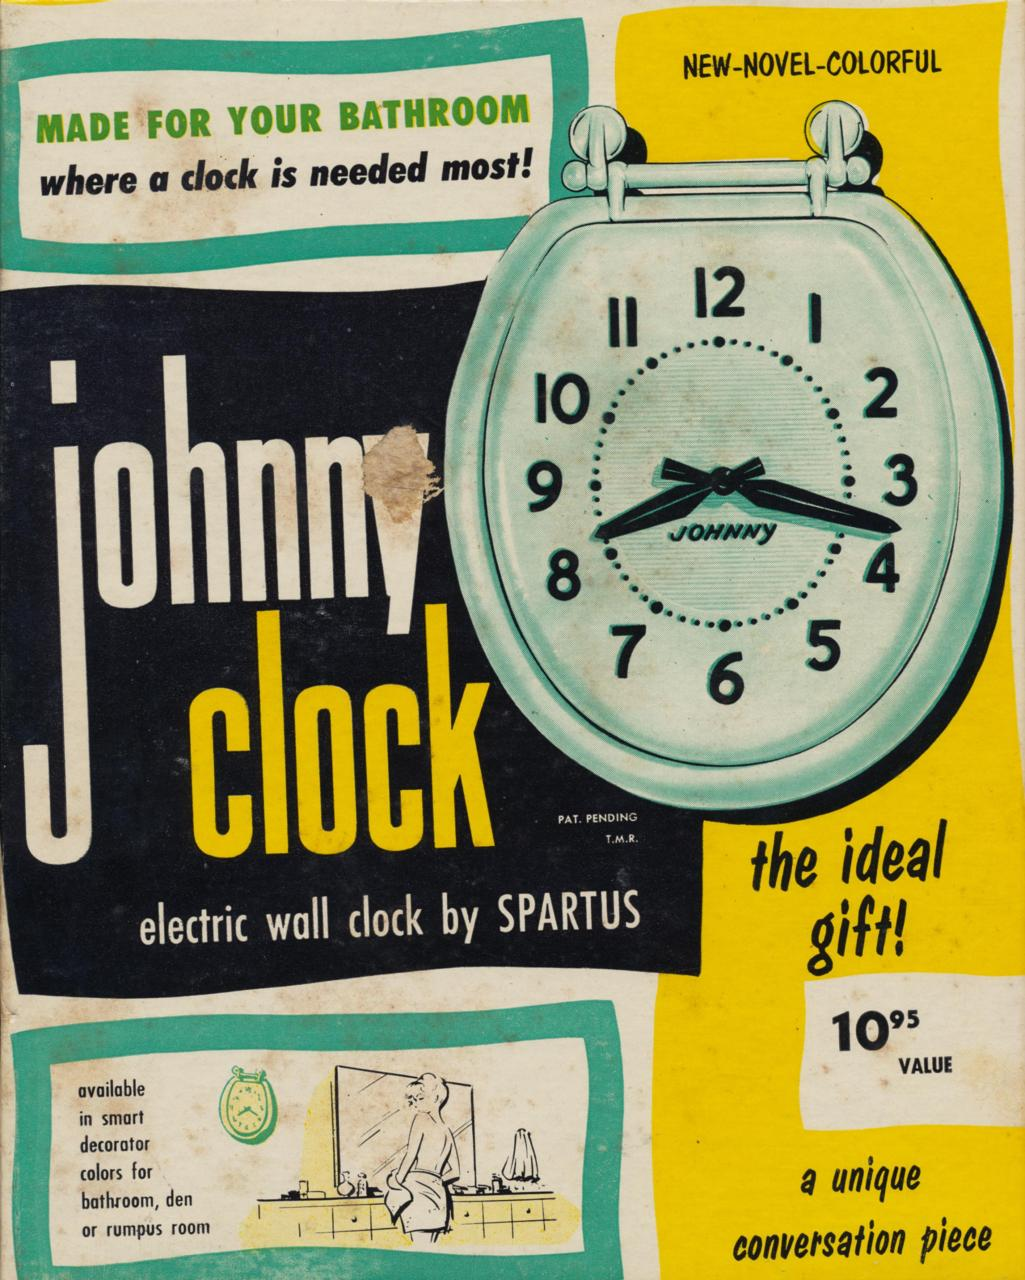 Toilet Clock – the idealgift